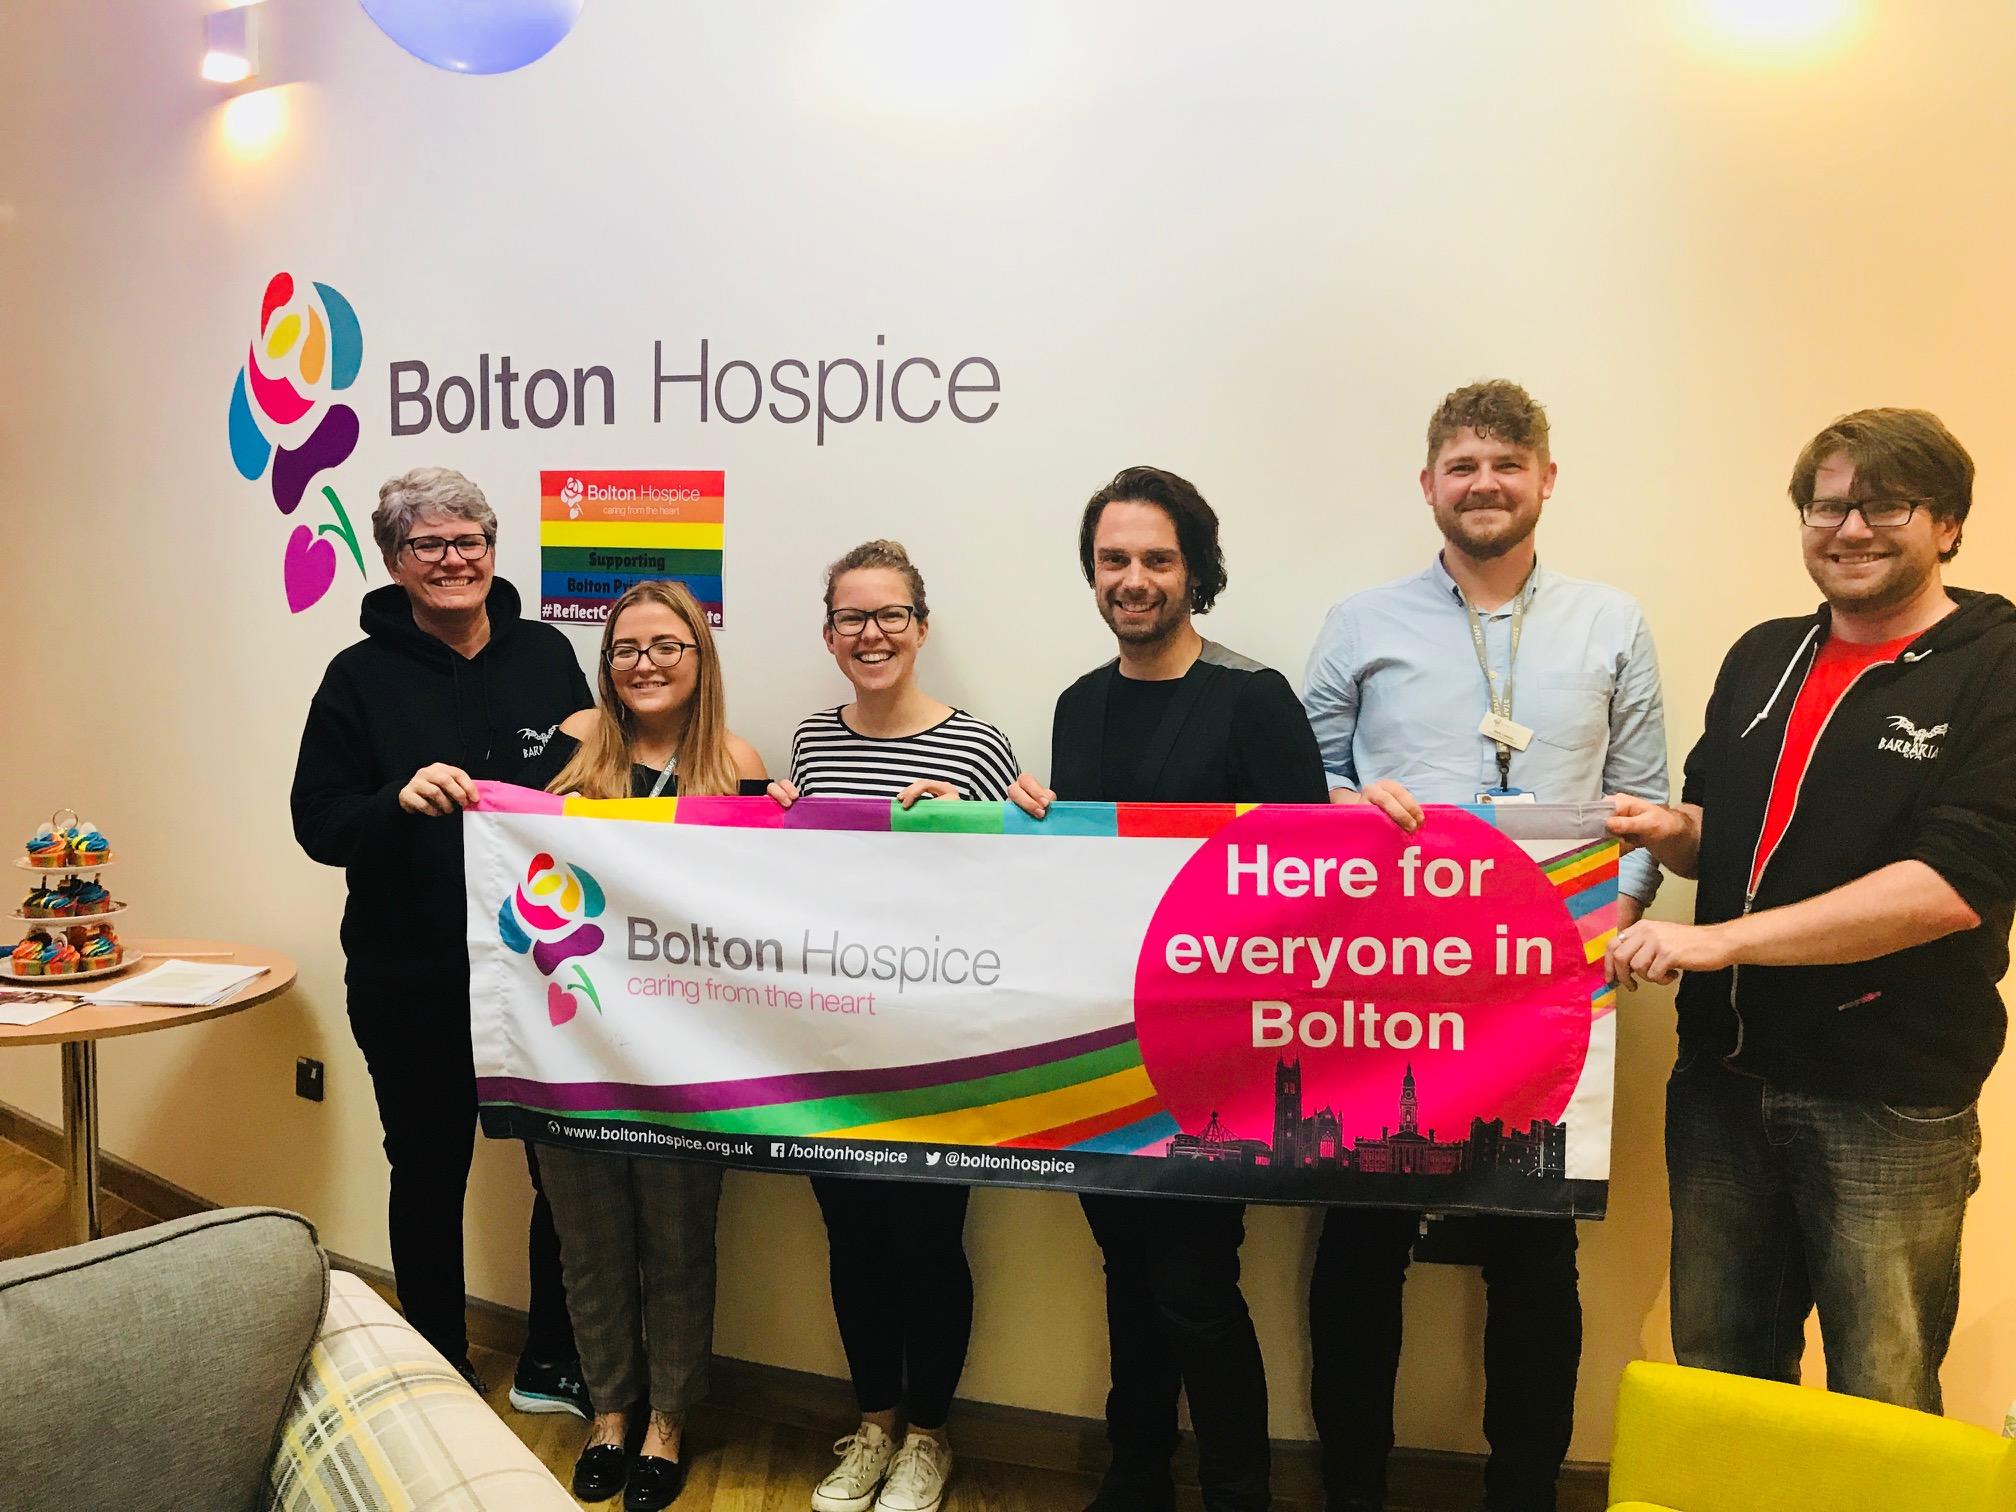 Bolton Hospice host Pride celebration